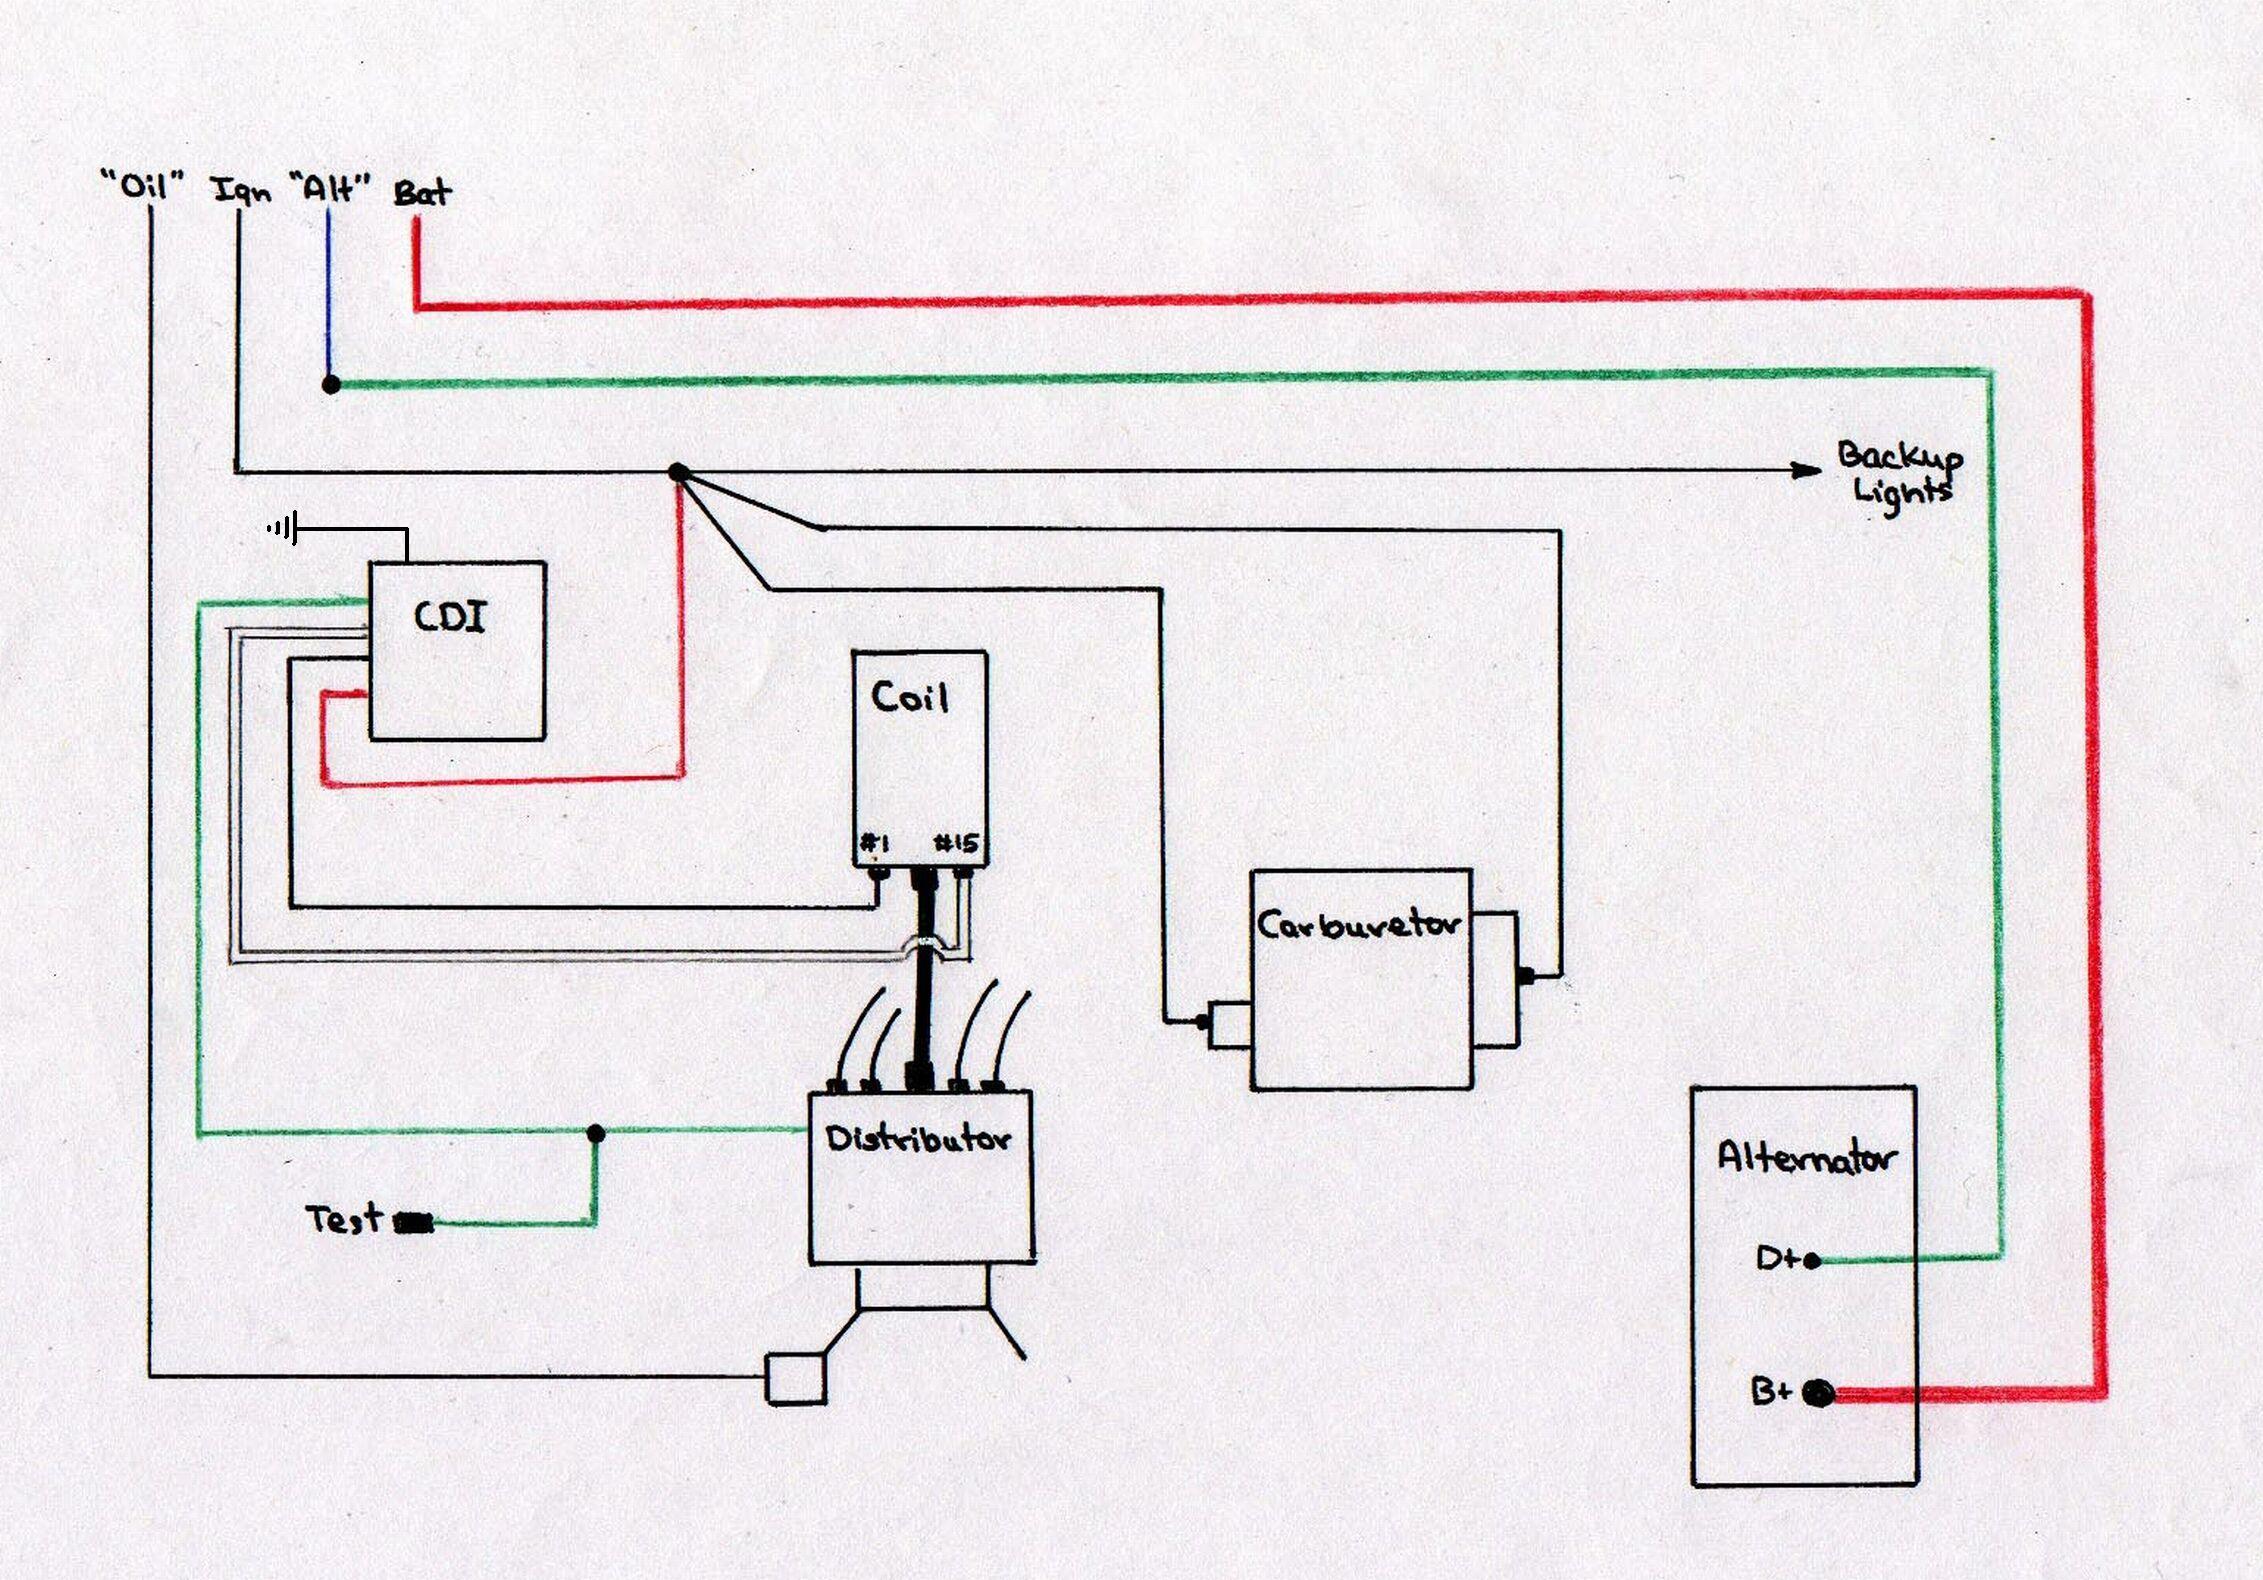 Generous Buyang Bmx Atv Wiring Diagram Gallery - Electrical and ...